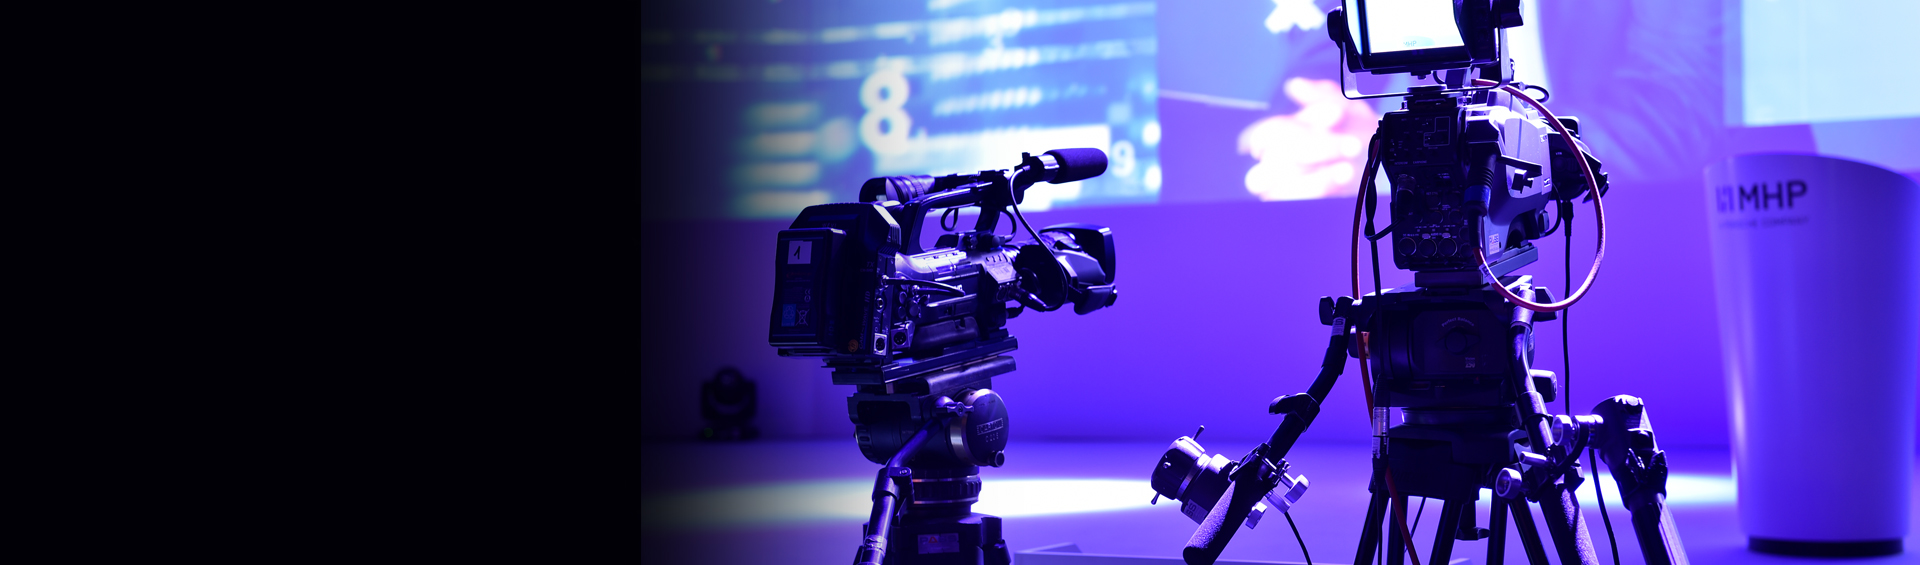 Videotechnik, Kamera